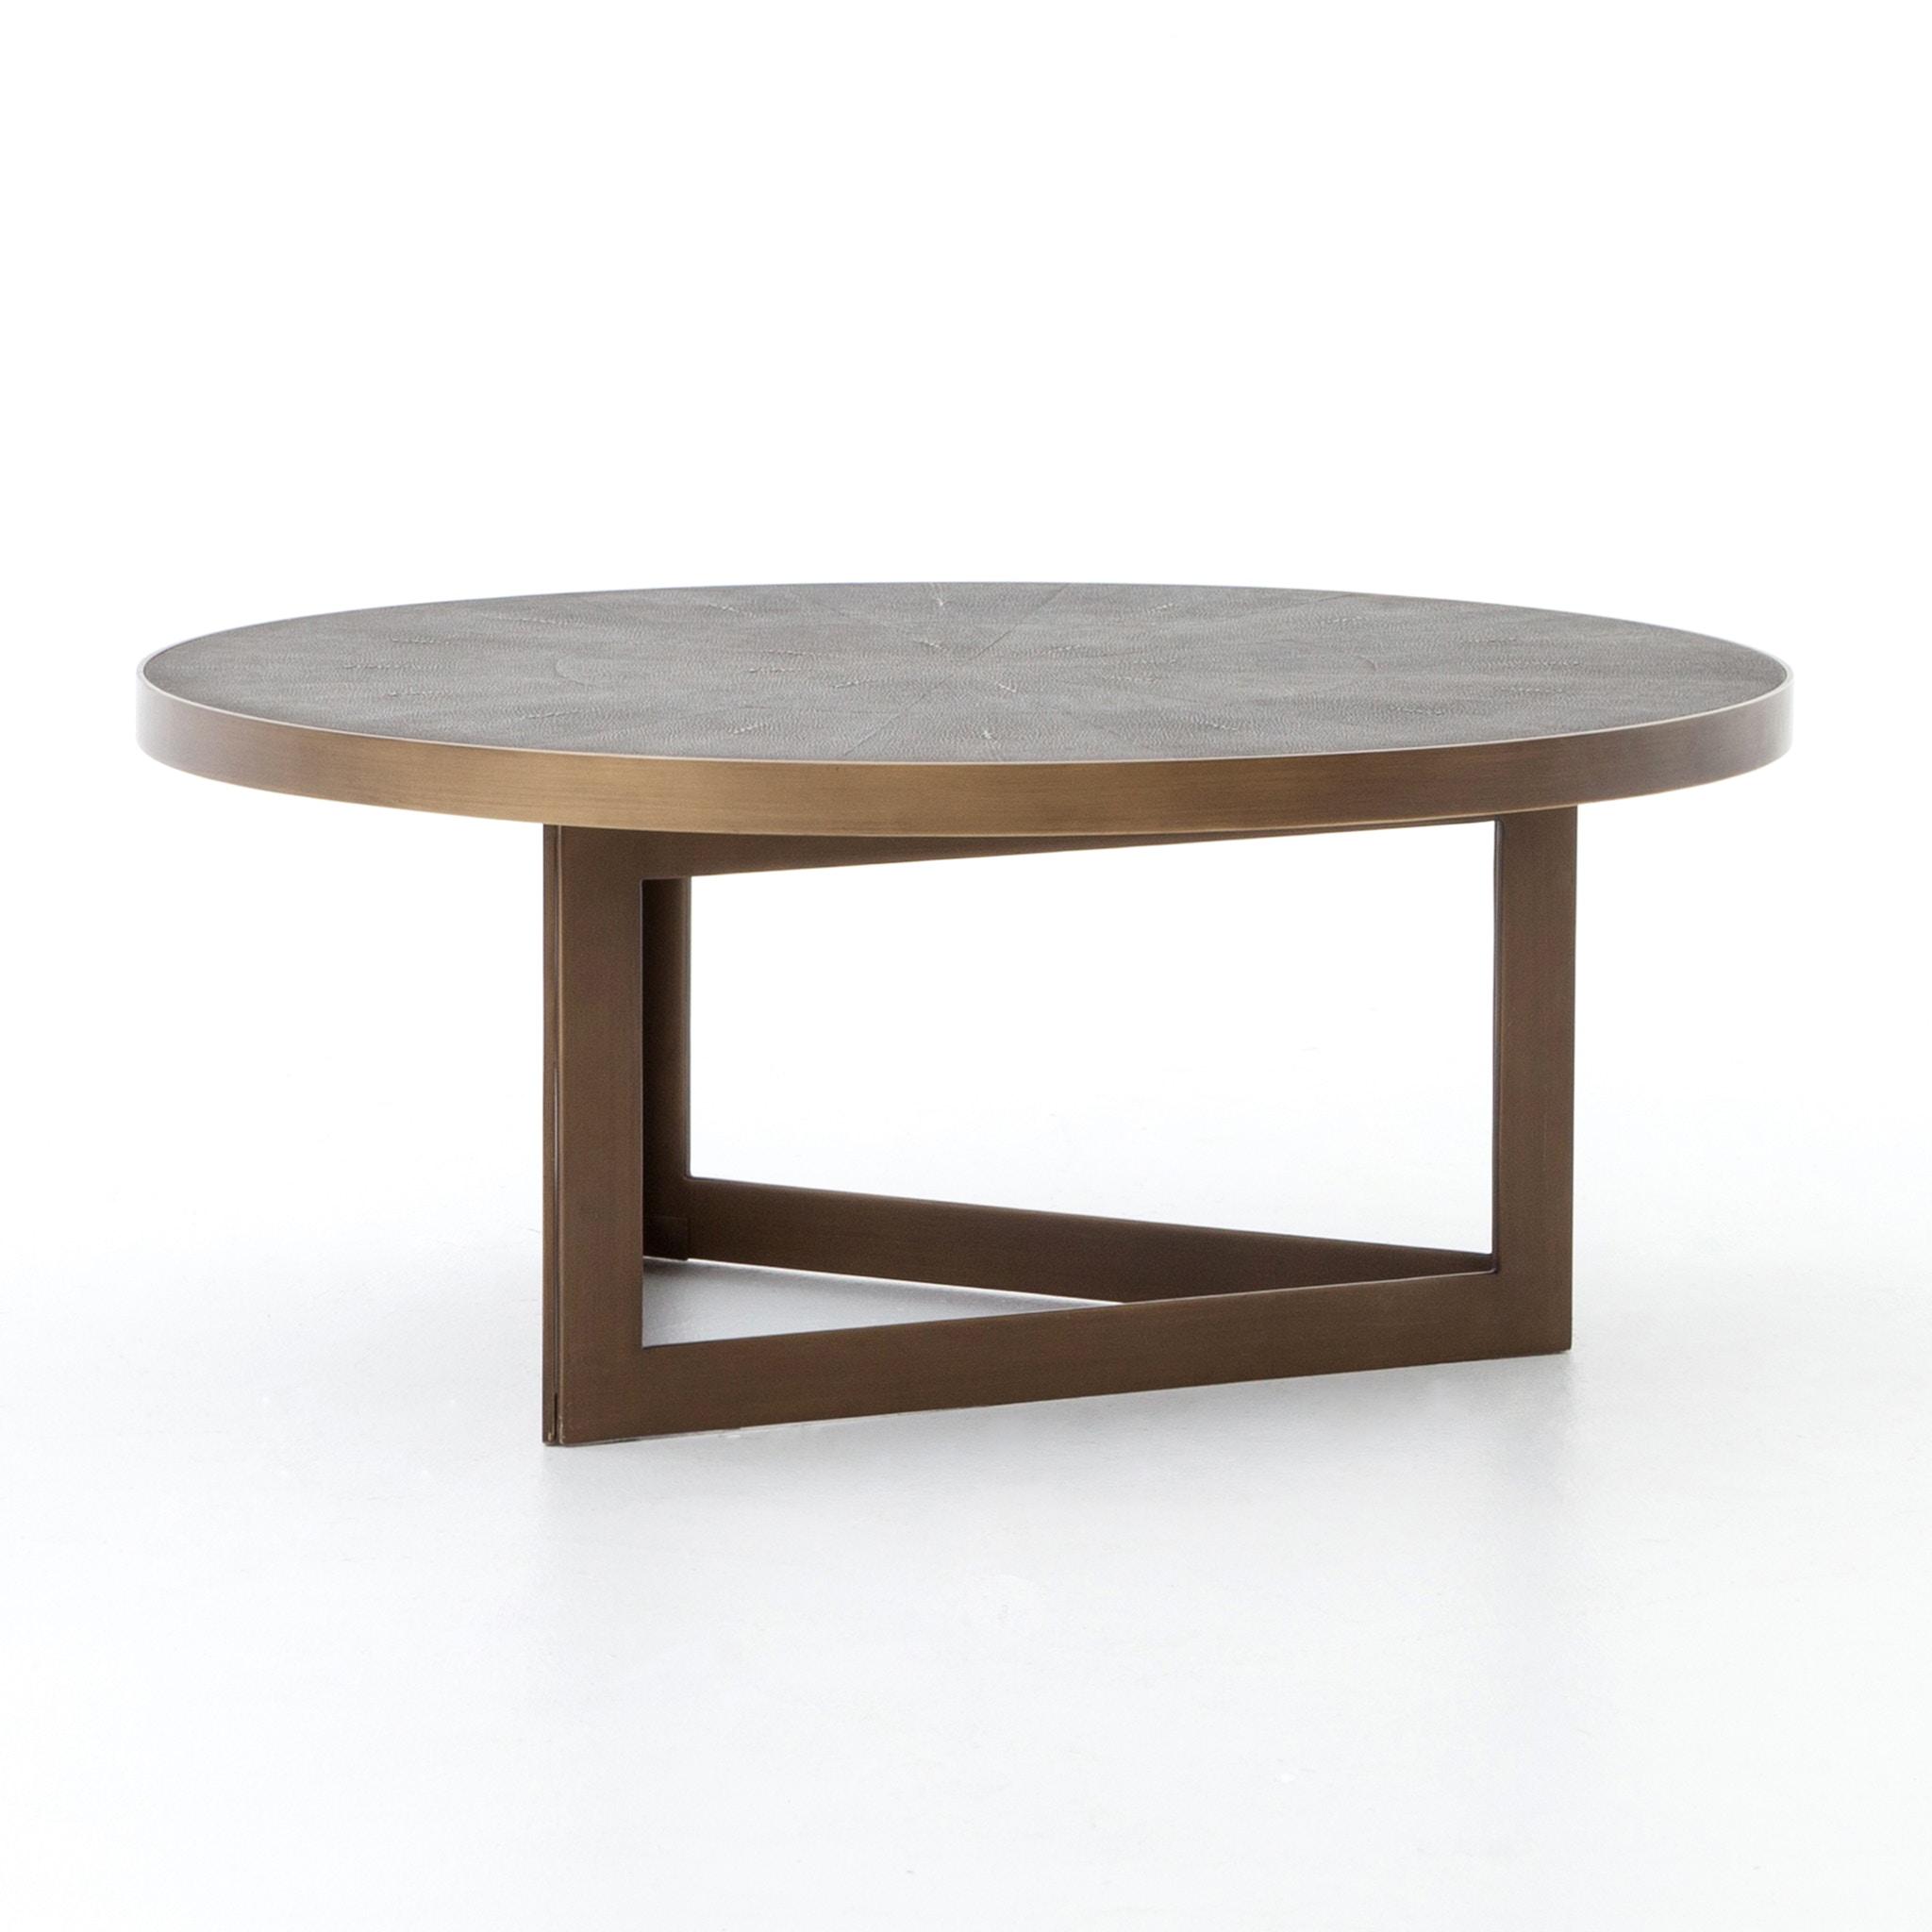 Four Hands Furniture Shagreen Round Coffee Table Antique Bras VBEN 002